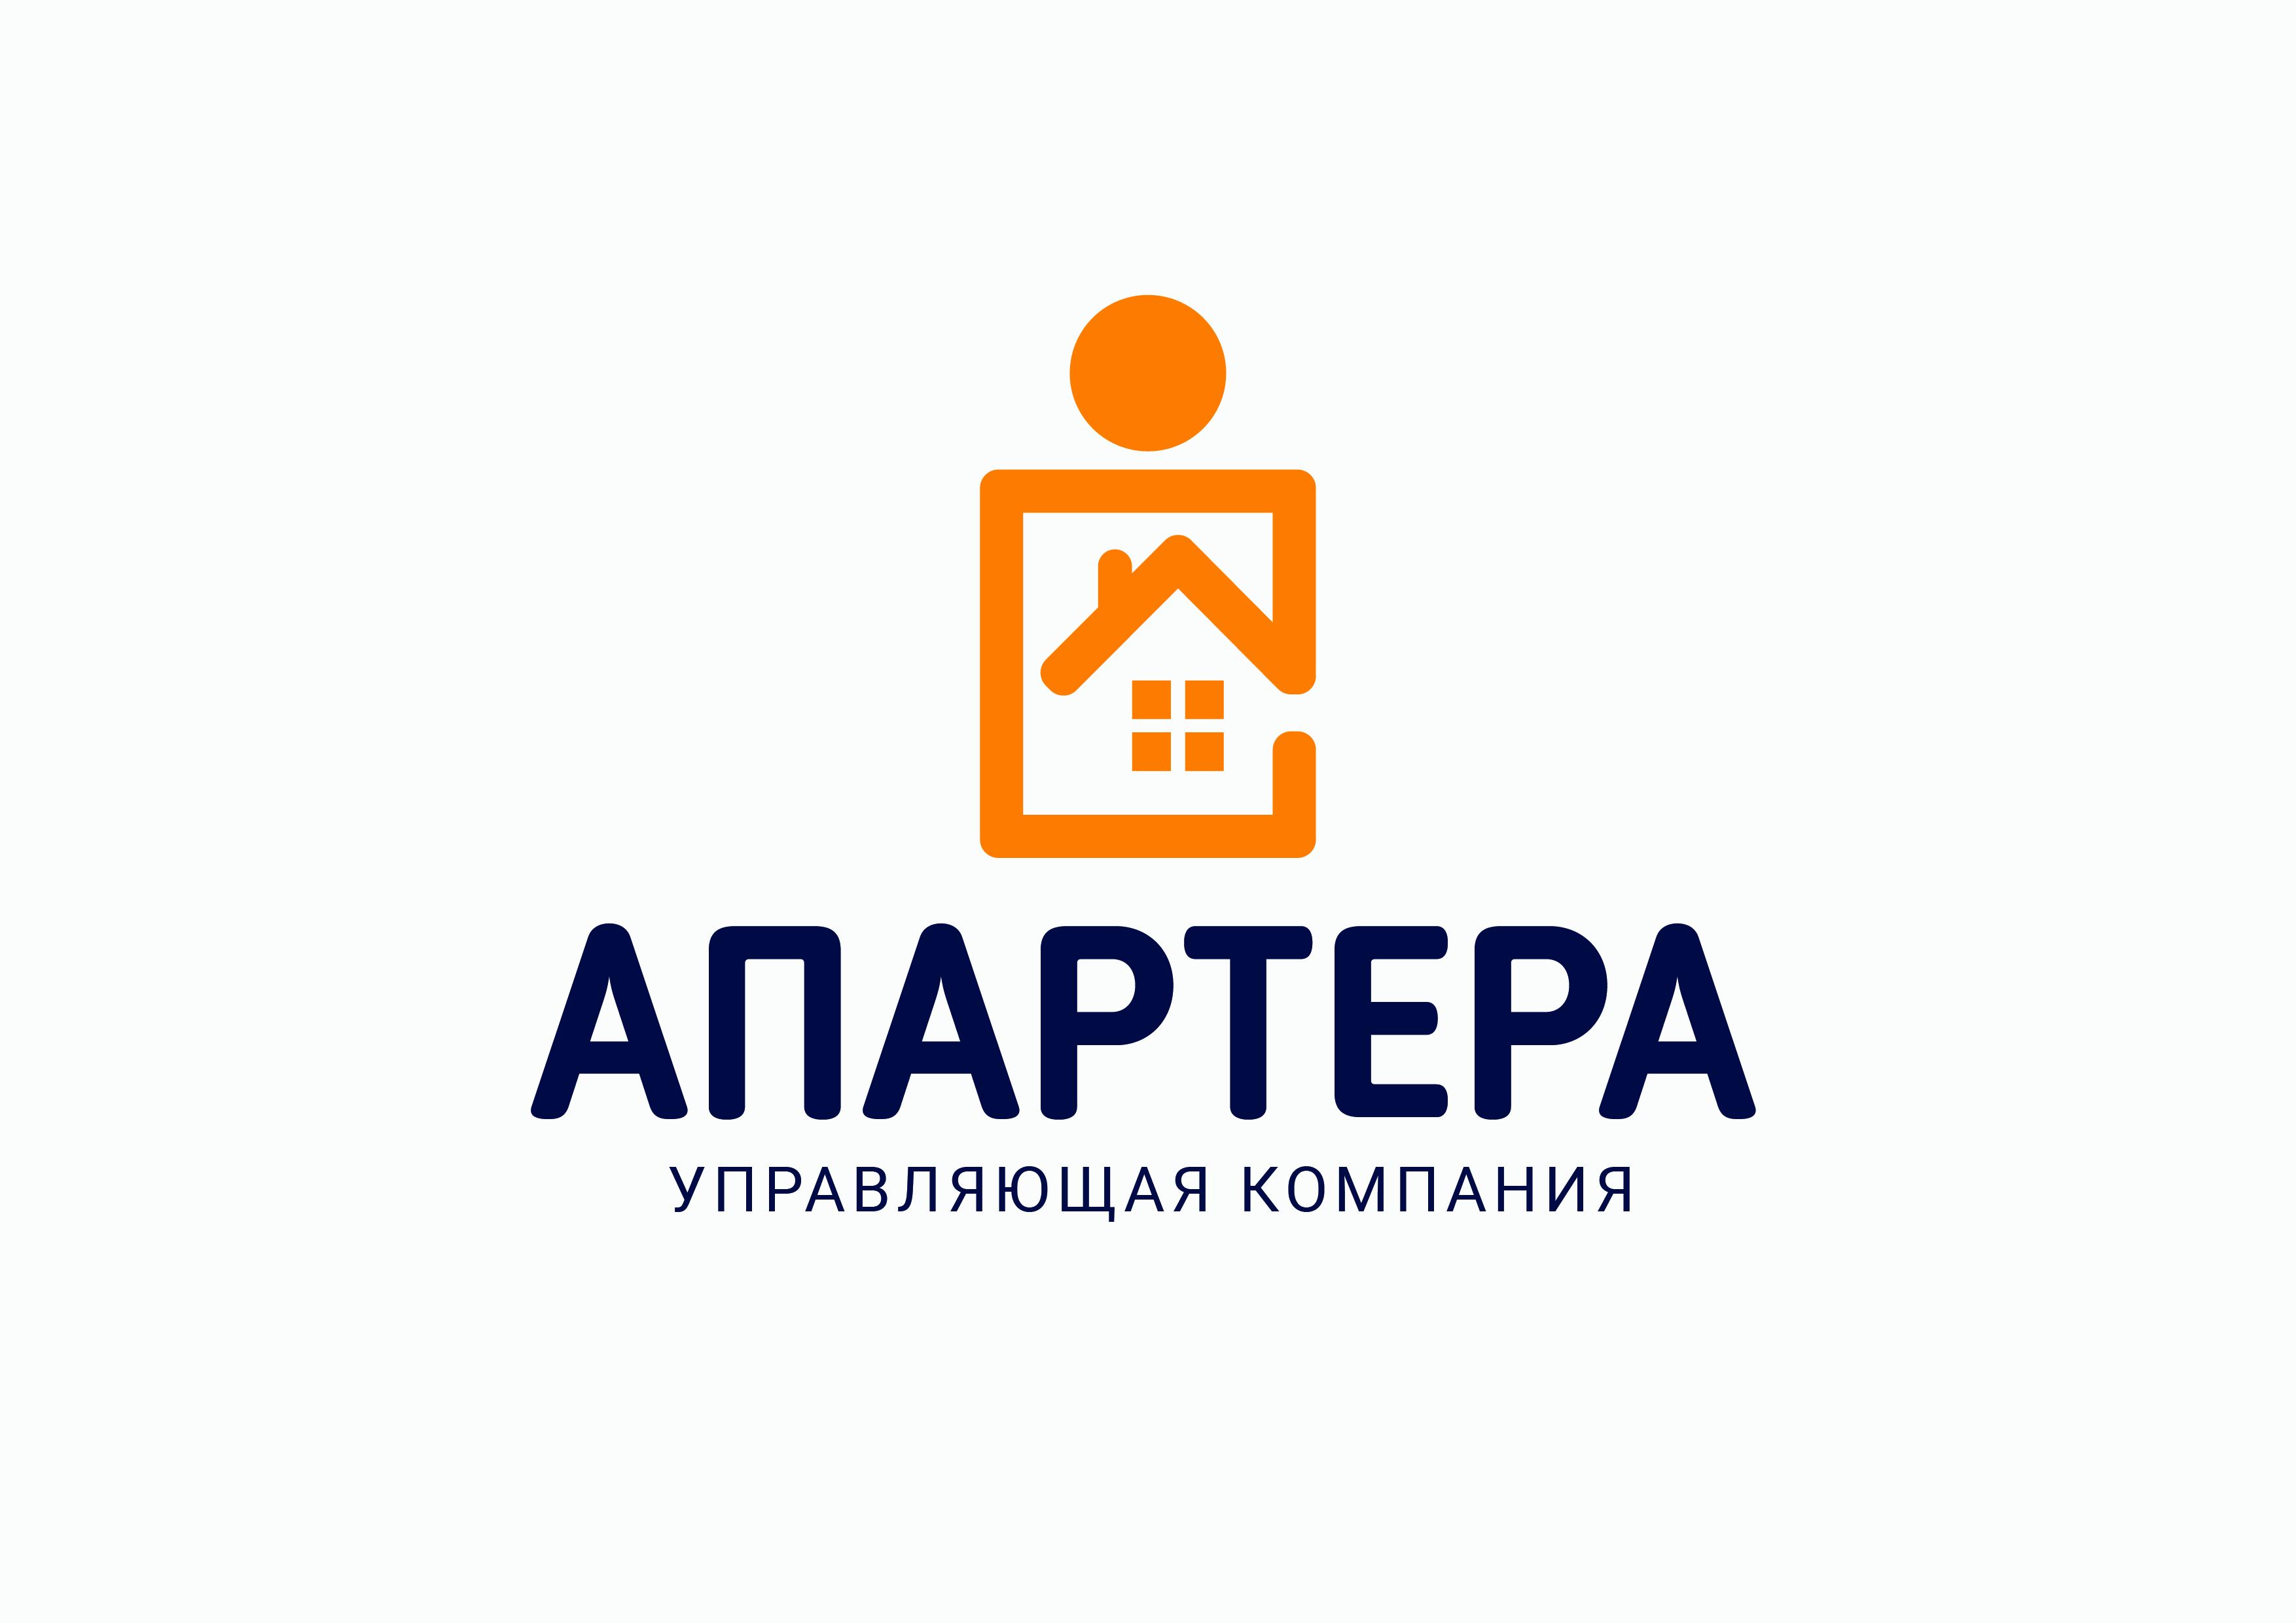 Логотип для управляющей компании  фото f_8055b7fad5d0e808.jpg